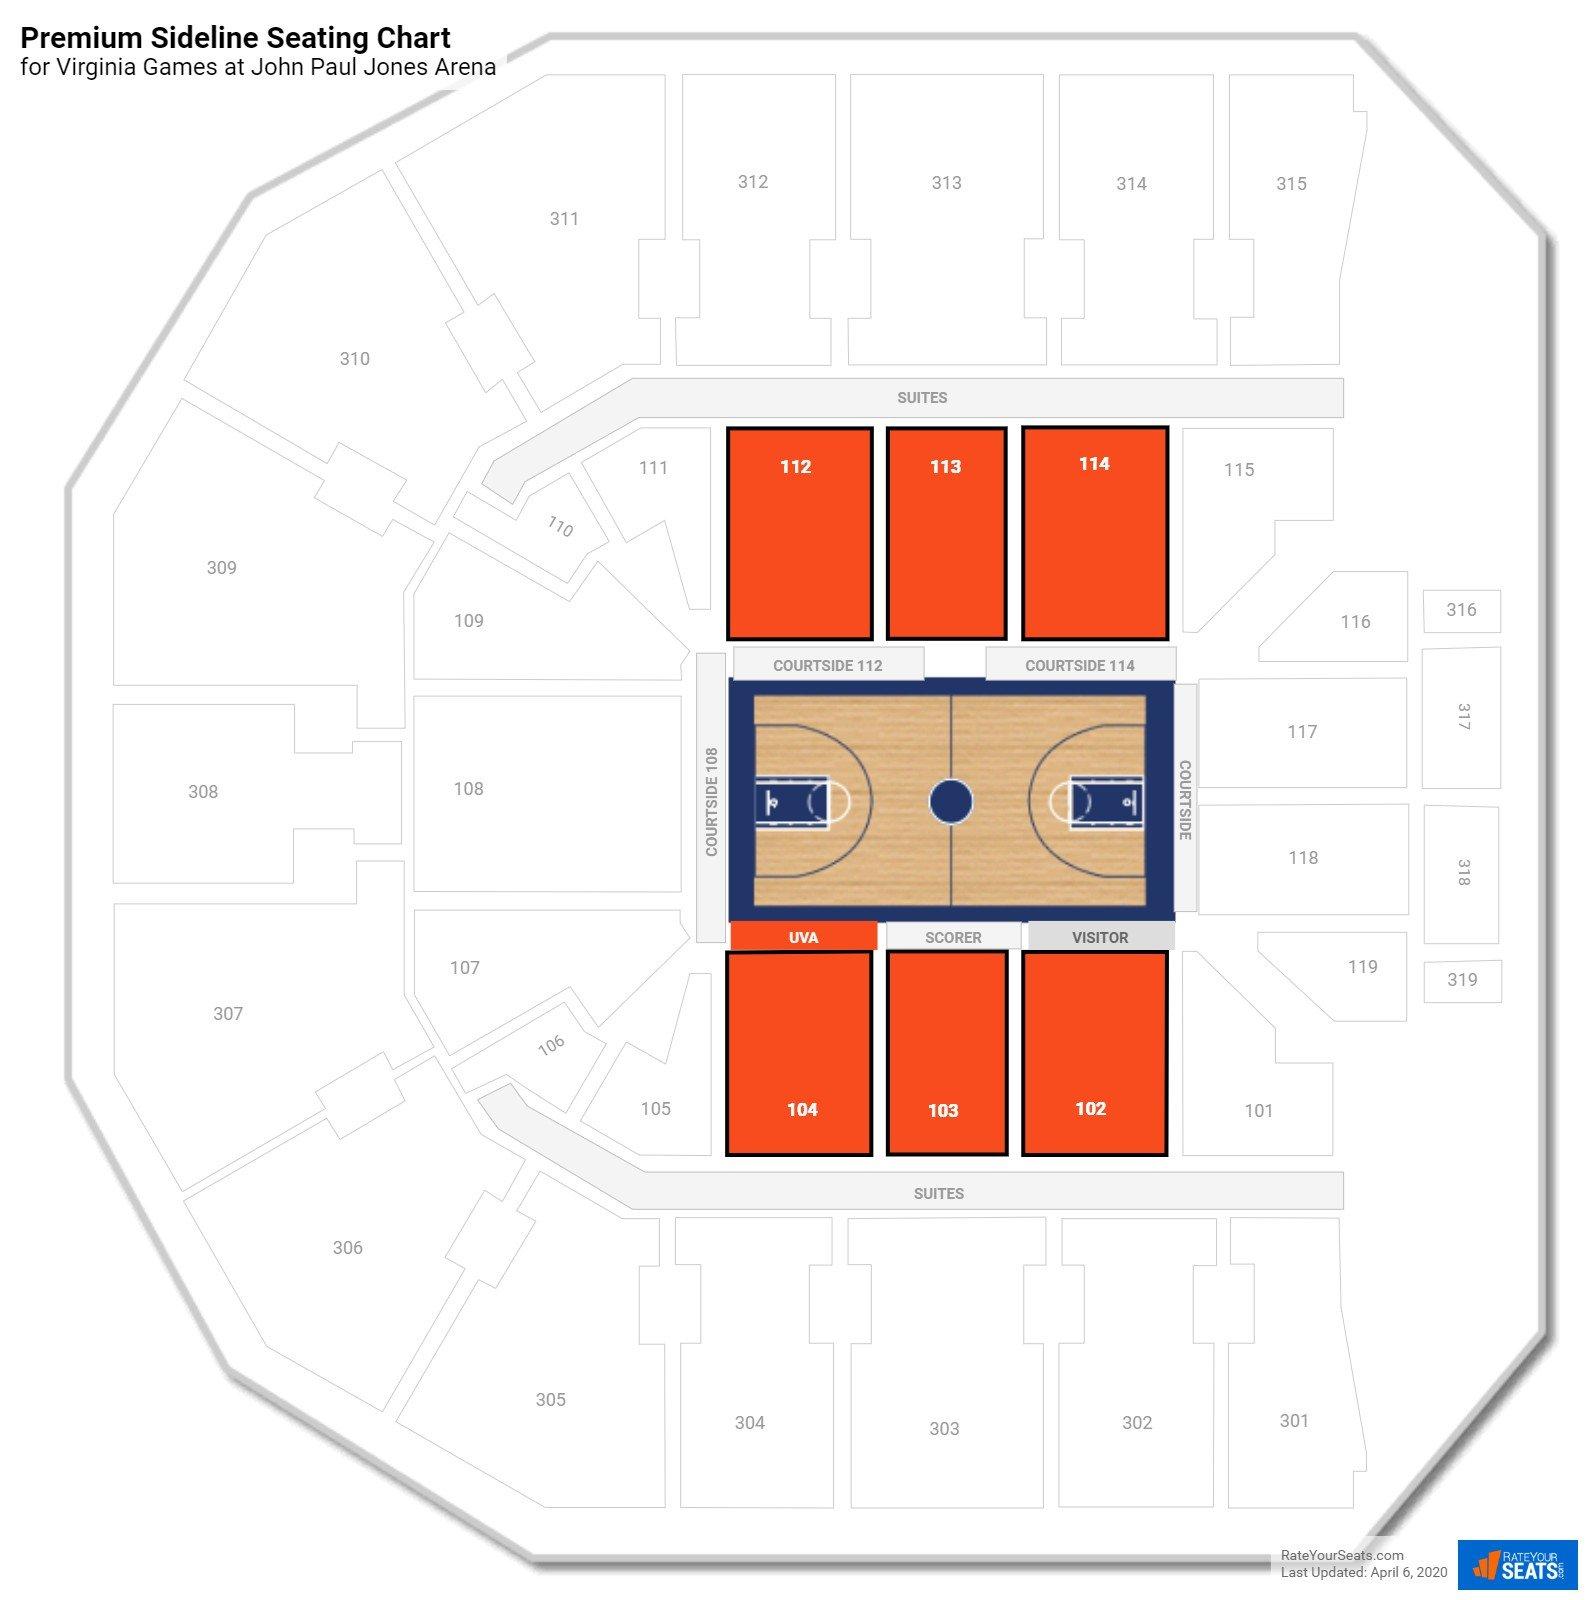 John Paul Jones Arena Premium Sideline Seating Chart